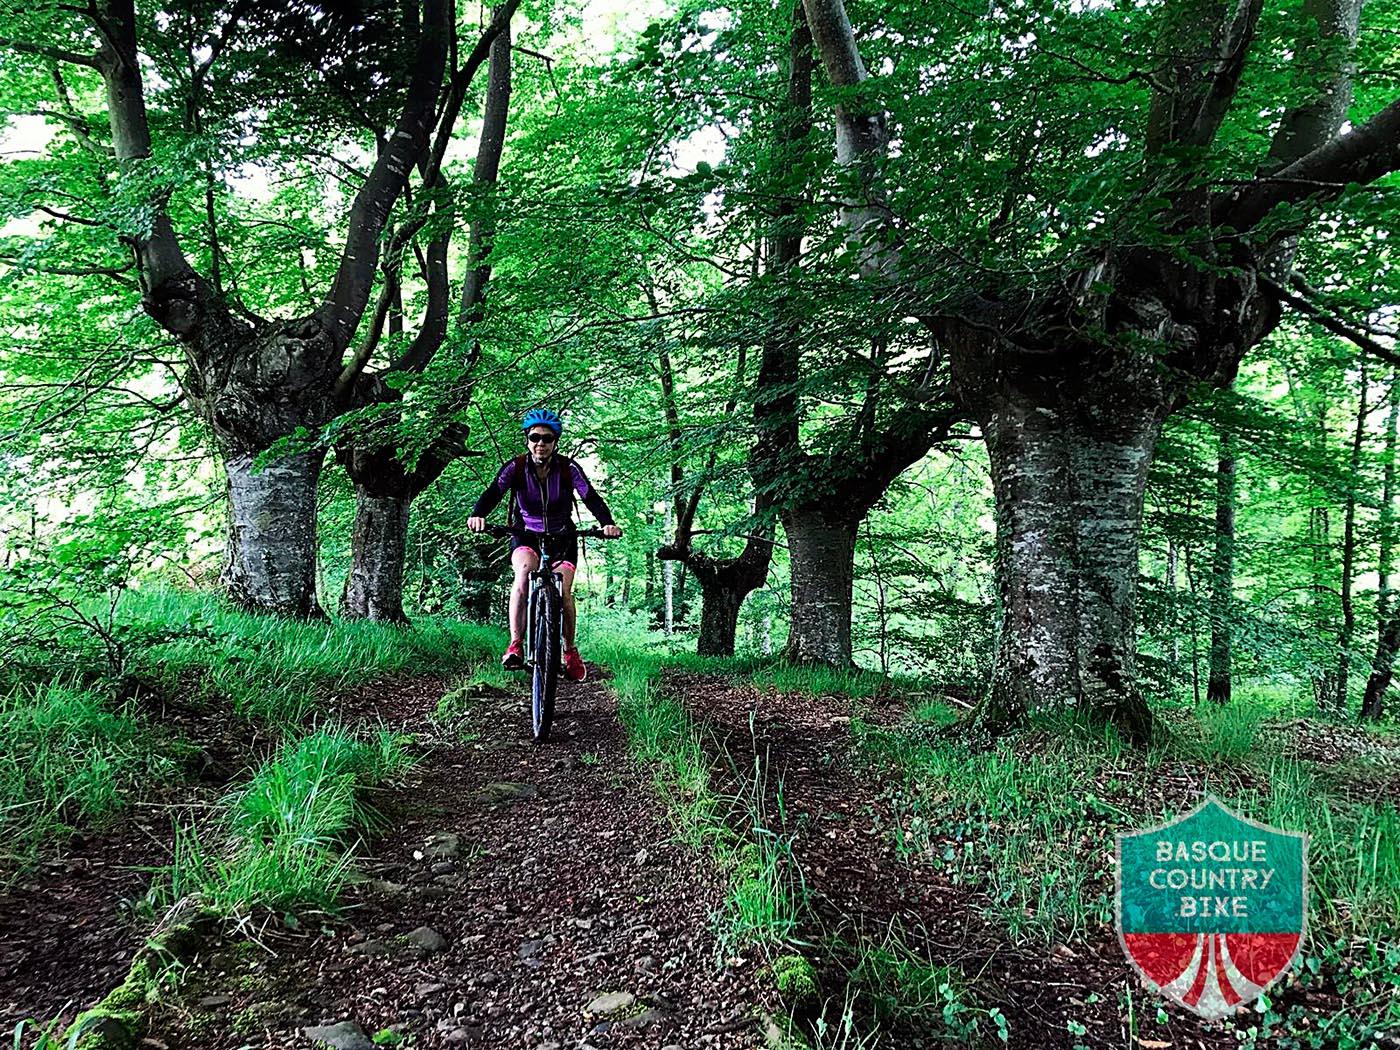 Basque Country Bike